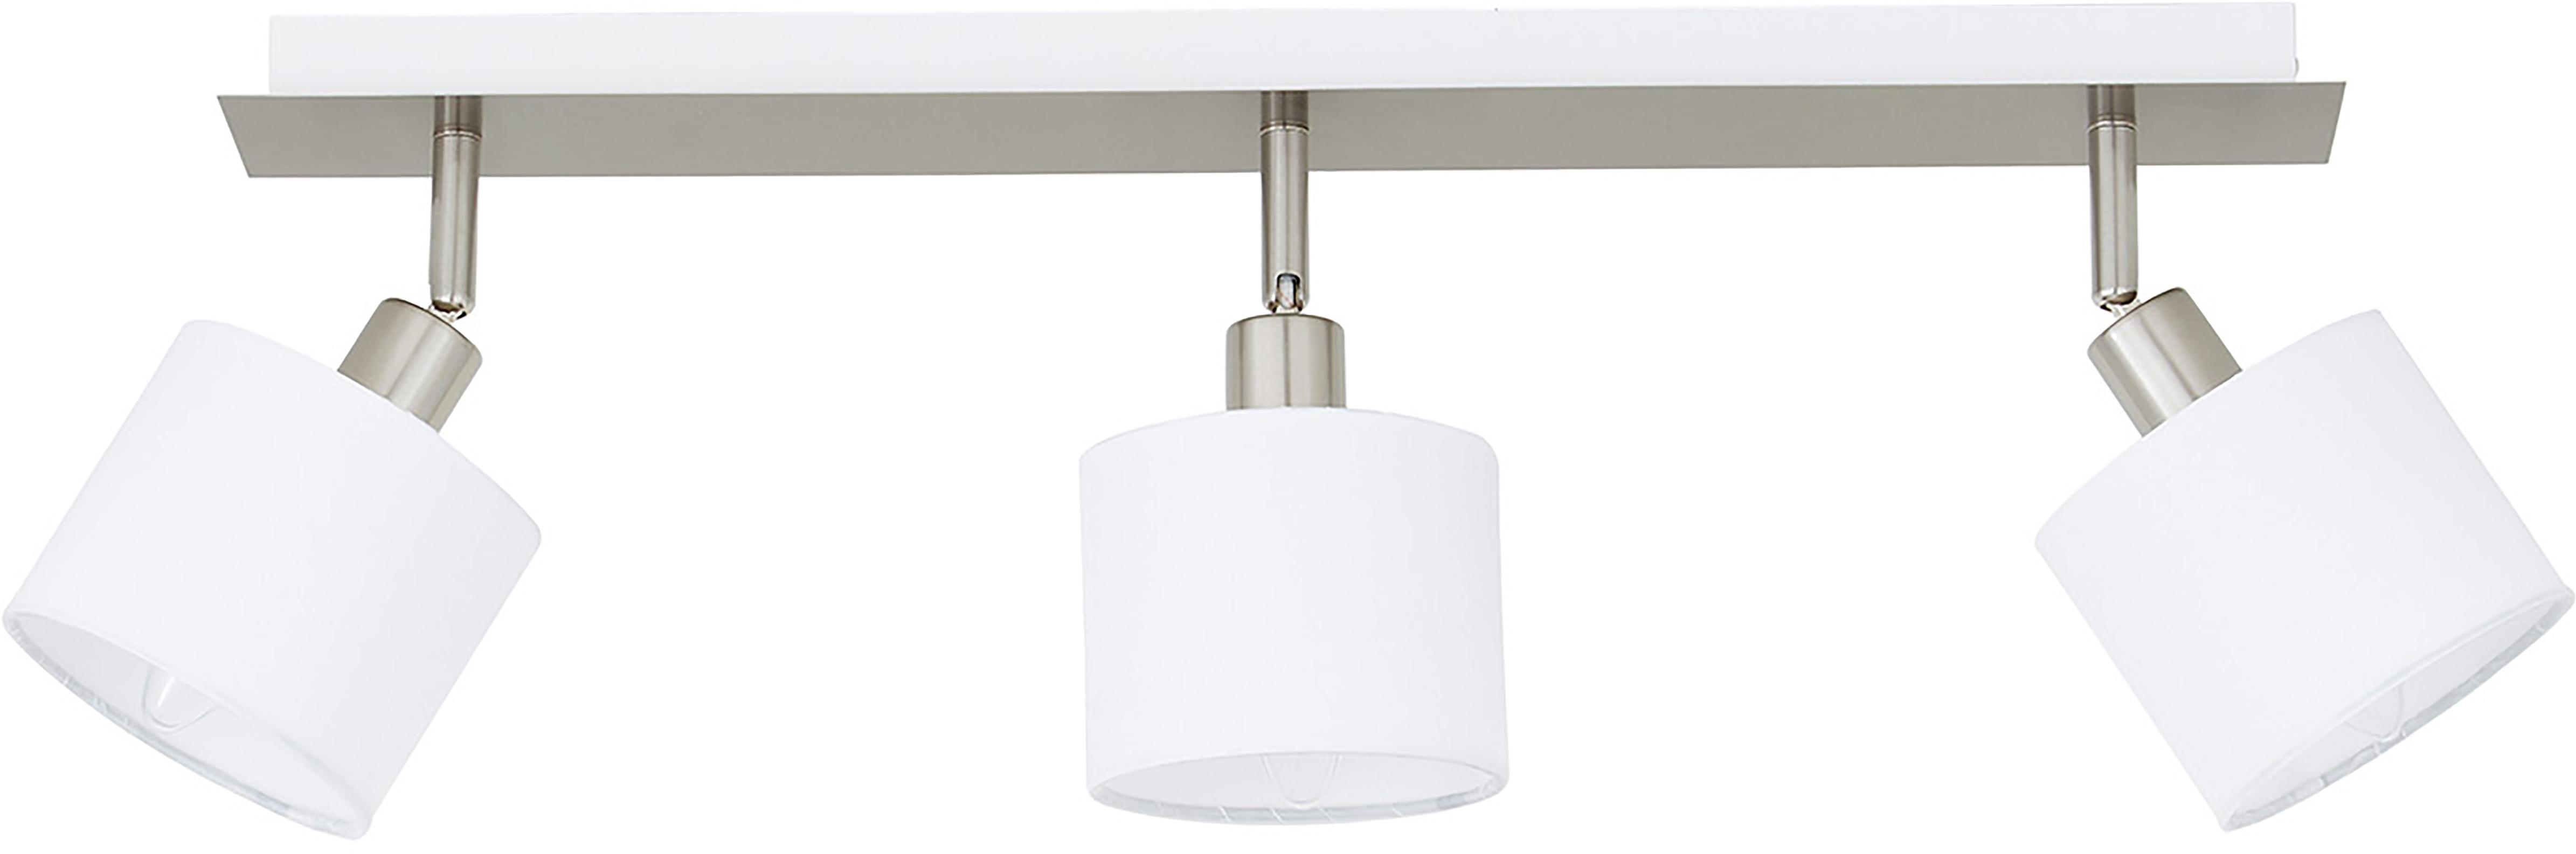 Faretti a soffitto Casper, Baldacchino: metallo, nichelato, Paralume: tessuto, Argento, bianco, Larg. 56 x Alt. 7 cm